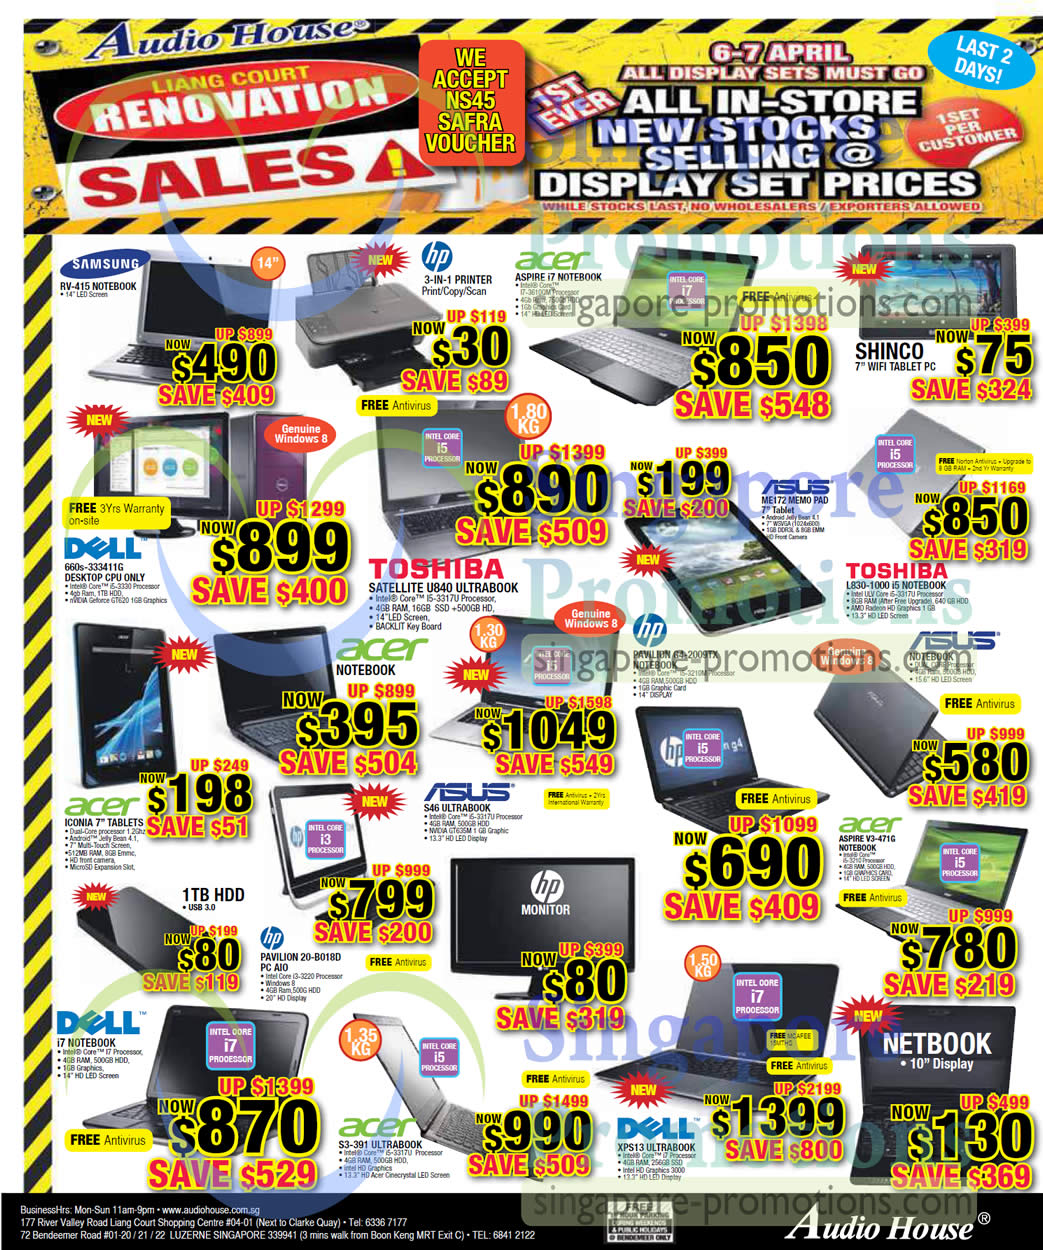 Samsung RV-415 Notebook, Dell Inspiron 660s-333411G Desktop PC, Dell XPS 13 Ultrabook Notebook, Acer S3-391 Ultrabook Notebook, Acer ASPIRE V3-471G Notebook, Asus ME172 MEMOPAD Tablet, HP PAVILION G4-2009TX Notebook, TOSHIBA L830-1000 Notebook